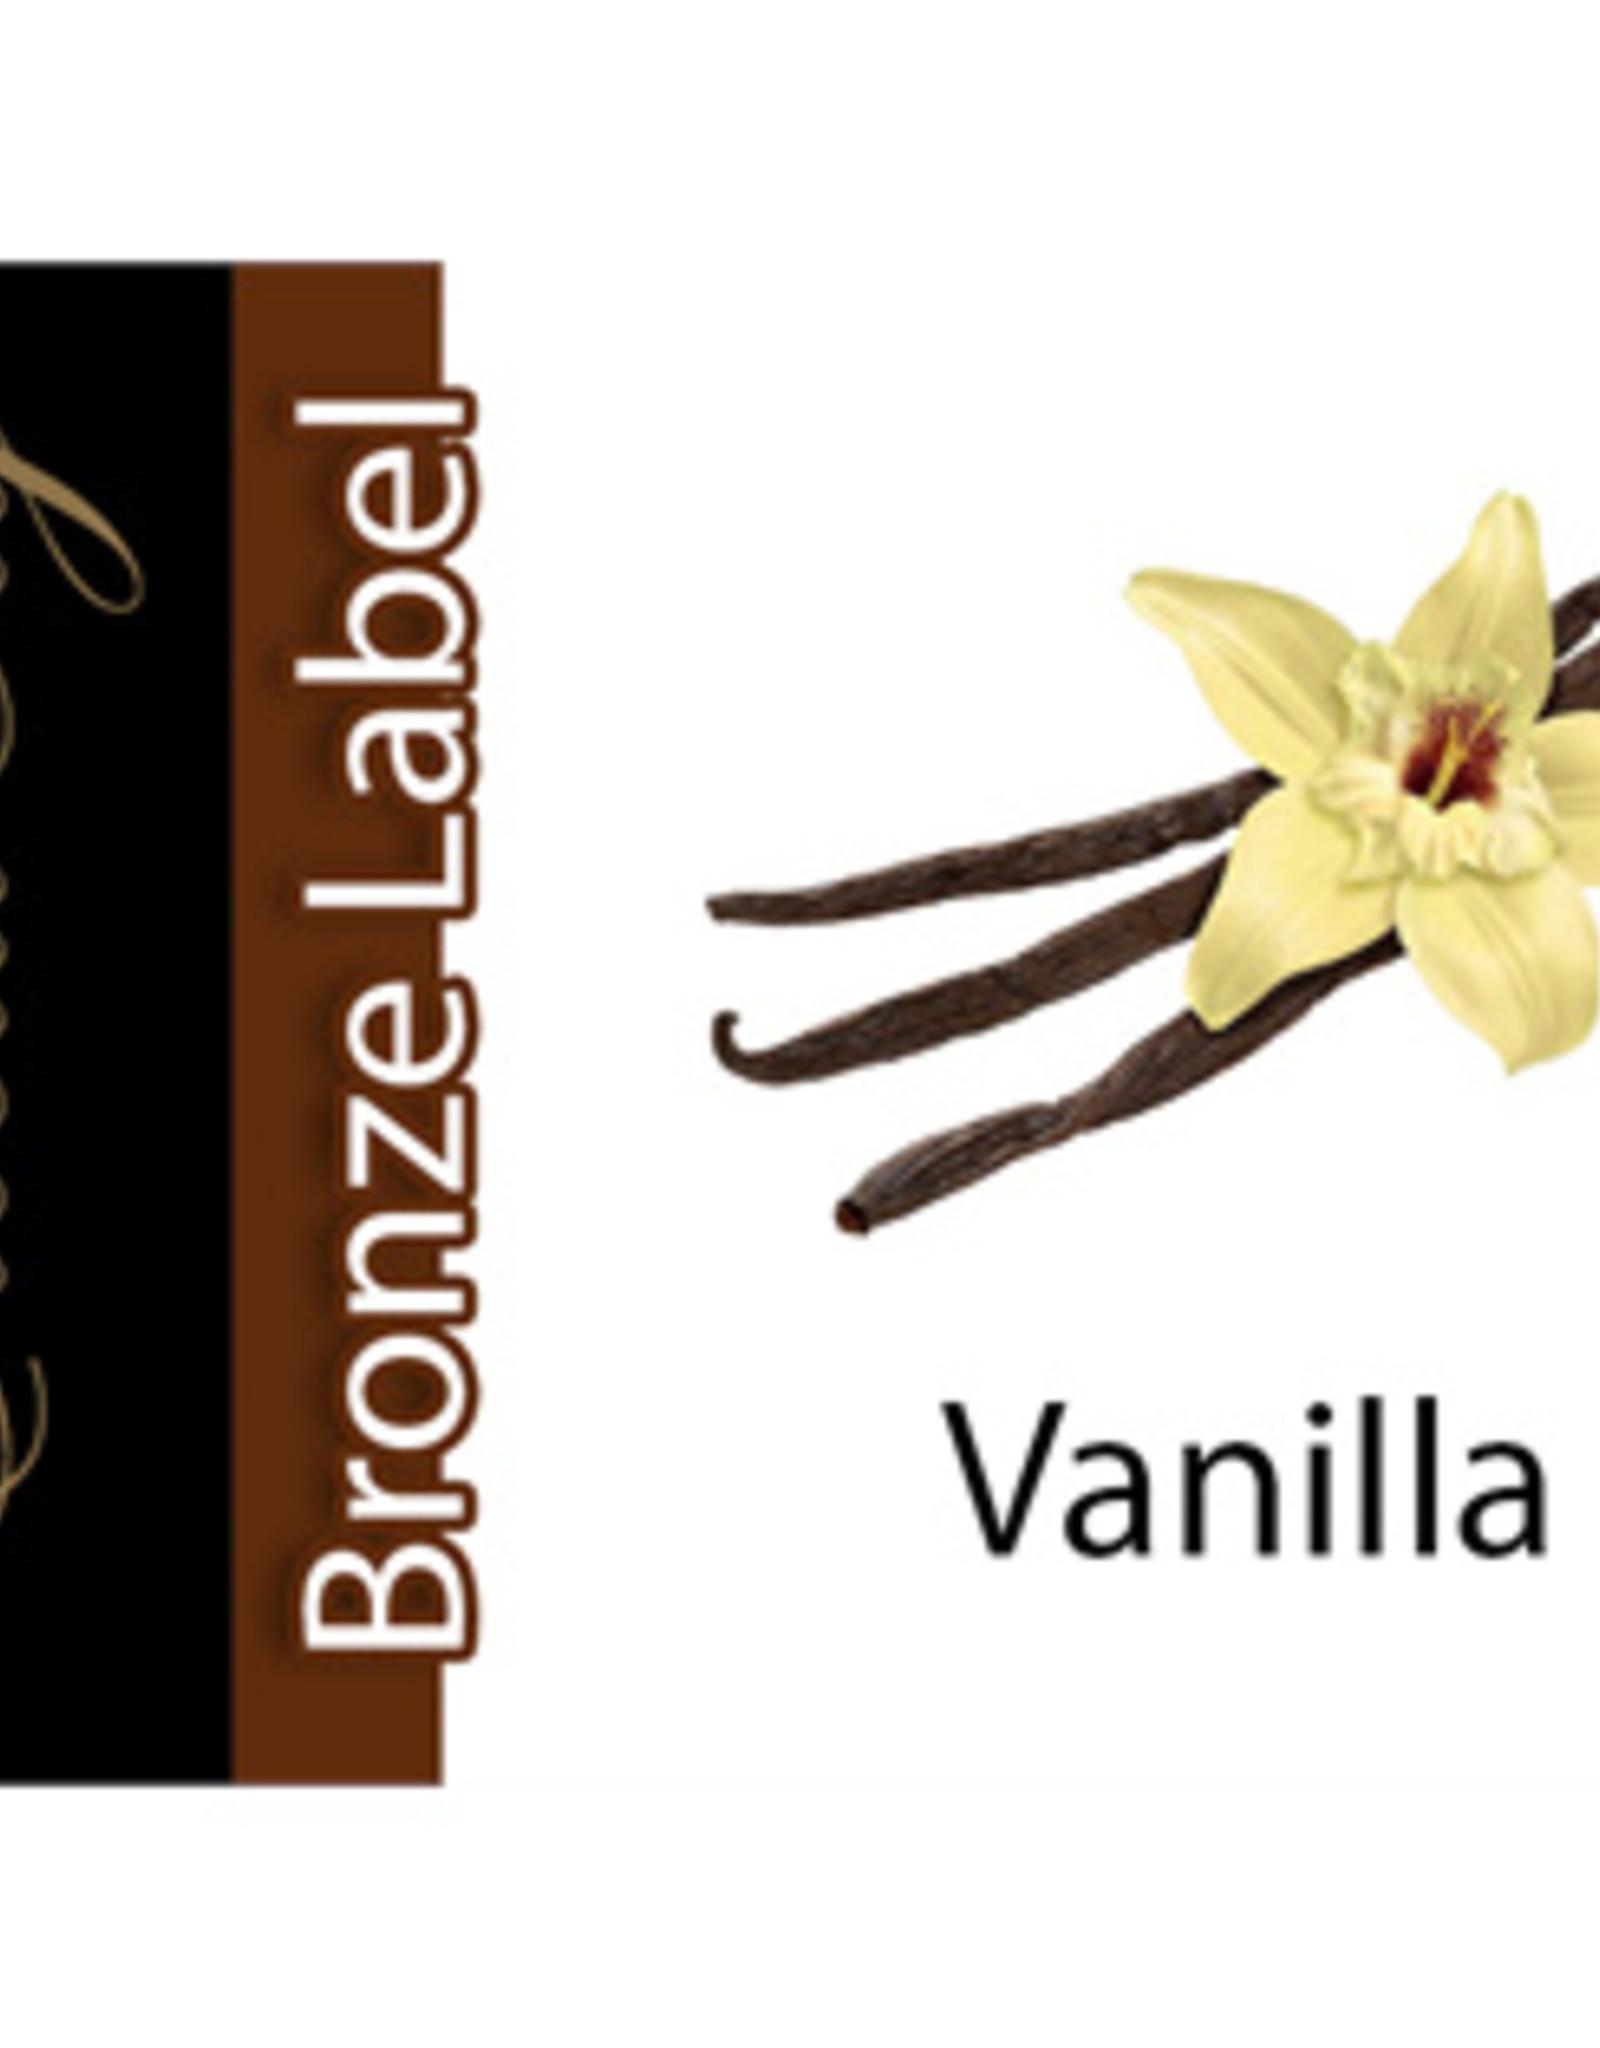 Exclucig Exclucig Bronze Label E-liquid Vanilla 6 mg Nicotine